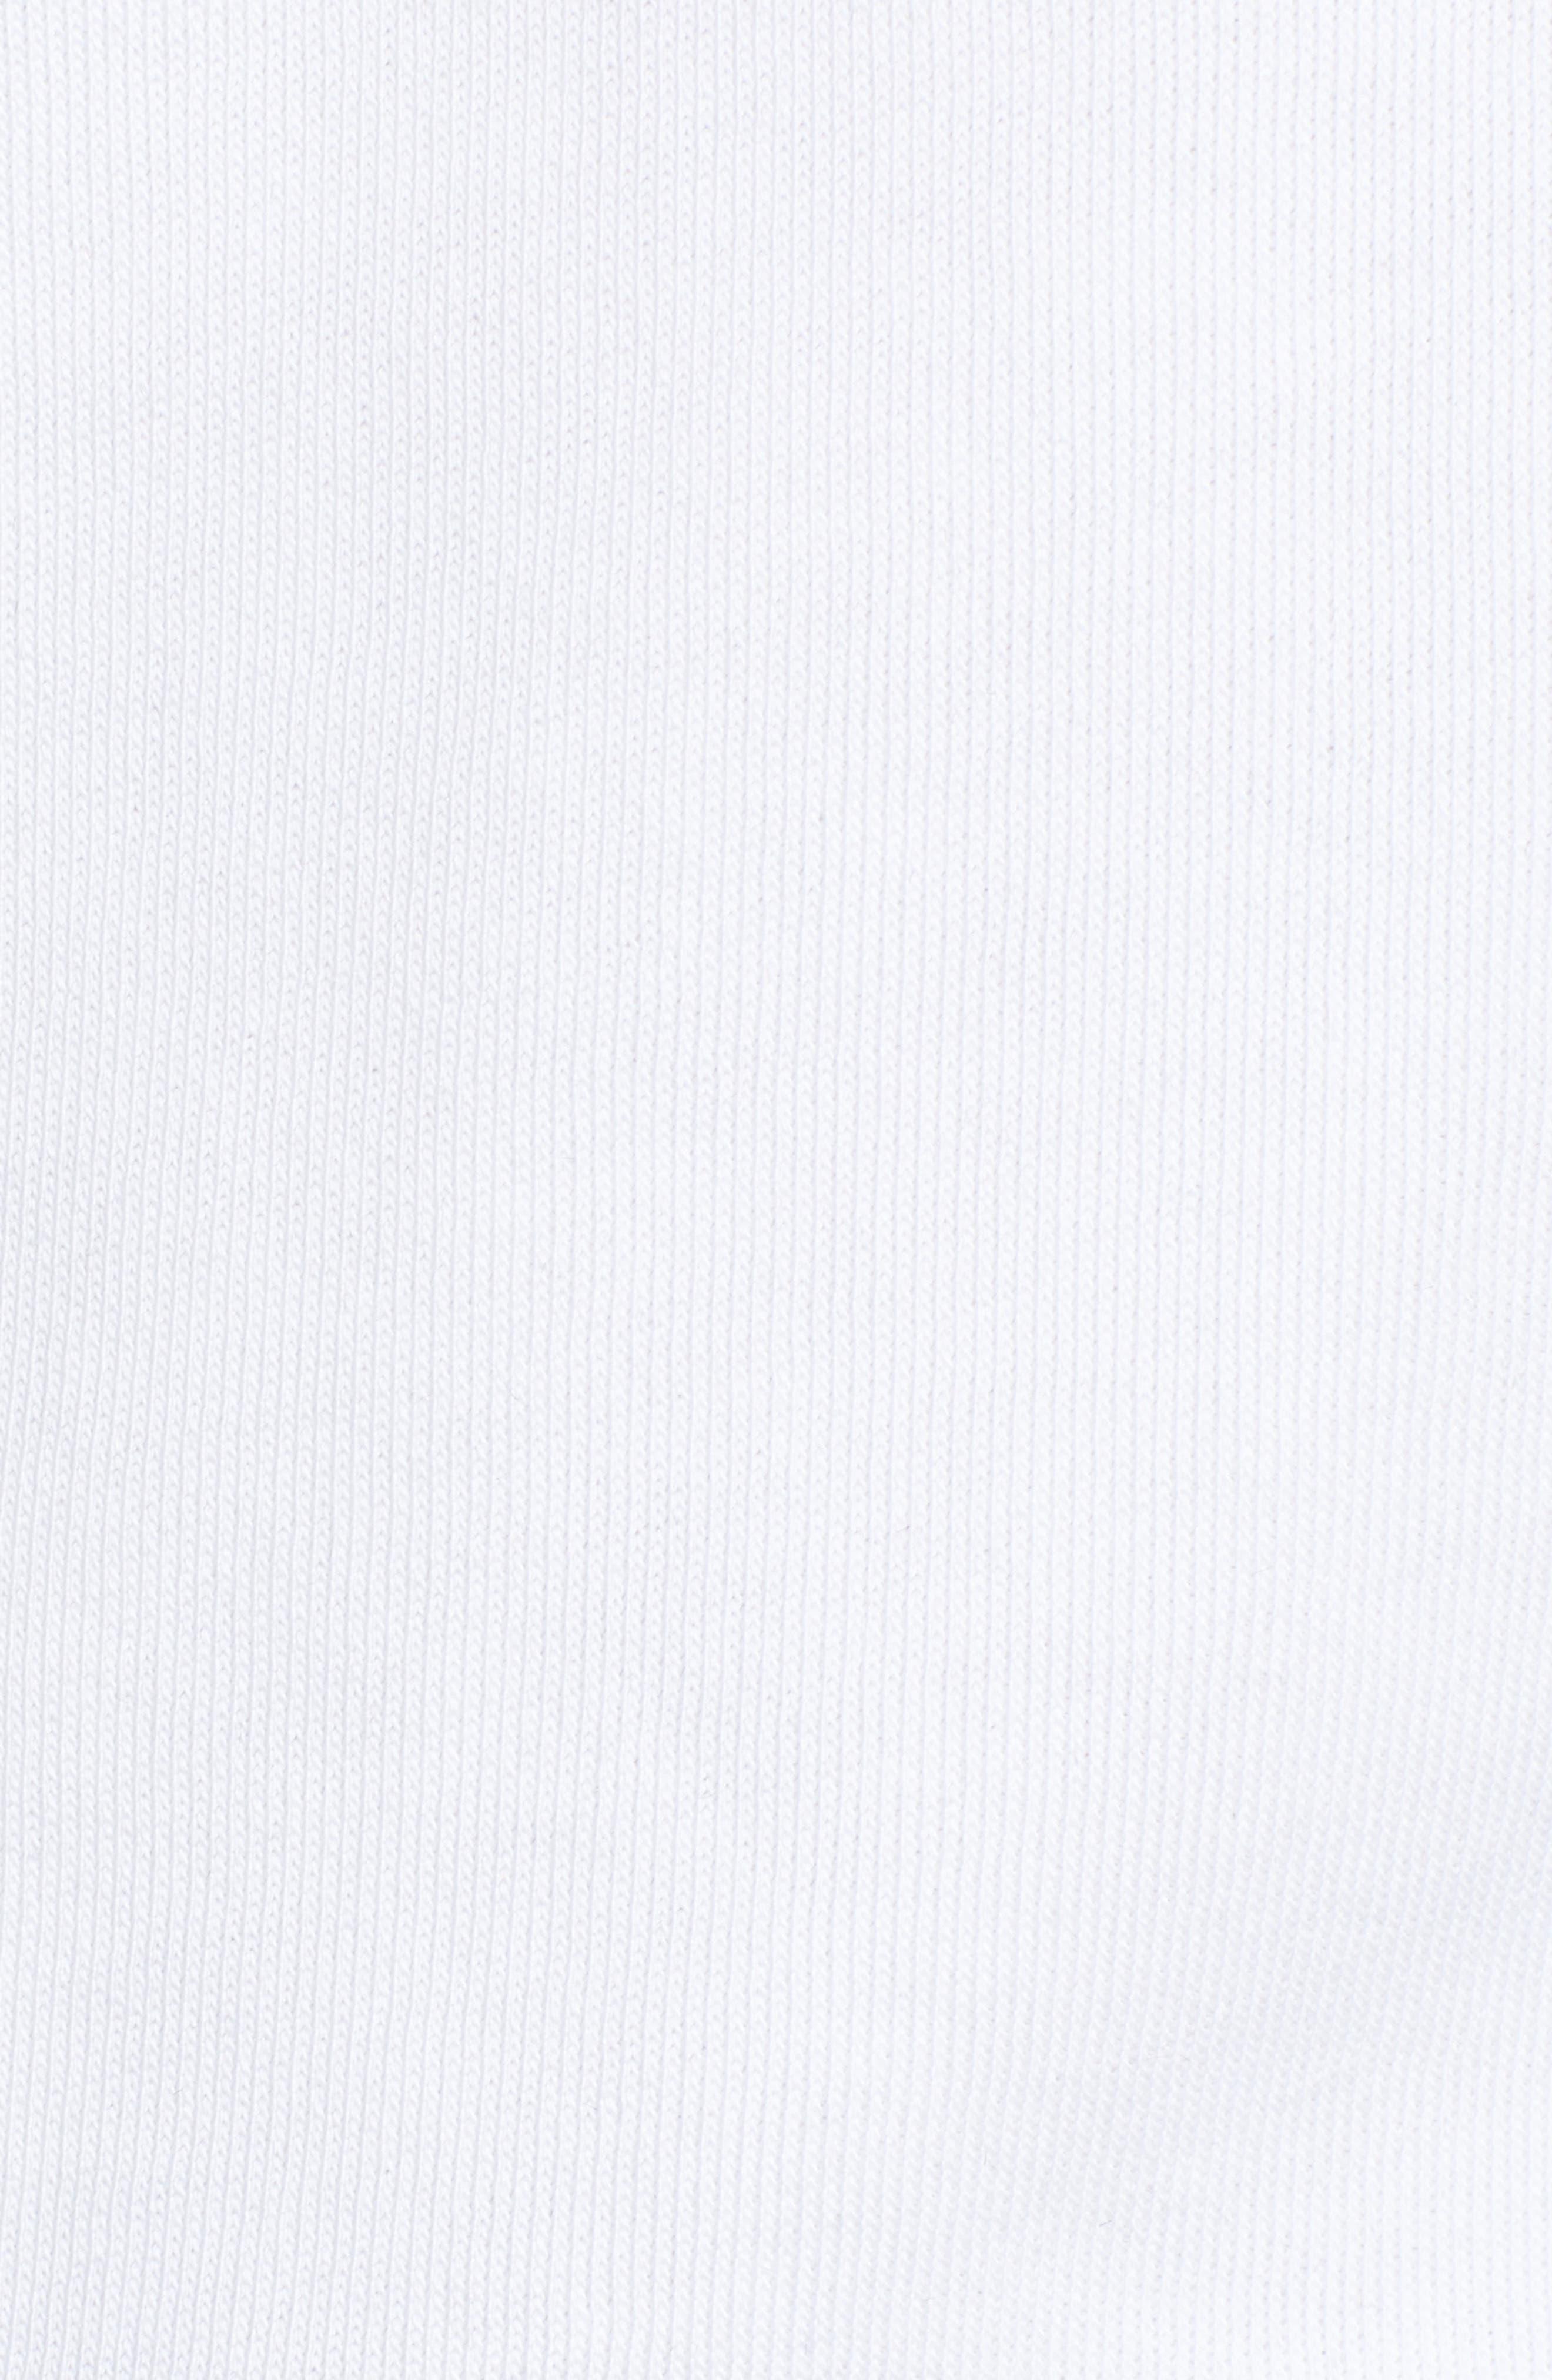 Fatale Fleece Sleeve Sweatshirt,                             Alternate thumbnail 5, color,                             CLEAN WHITE/ CLEAN BLACK